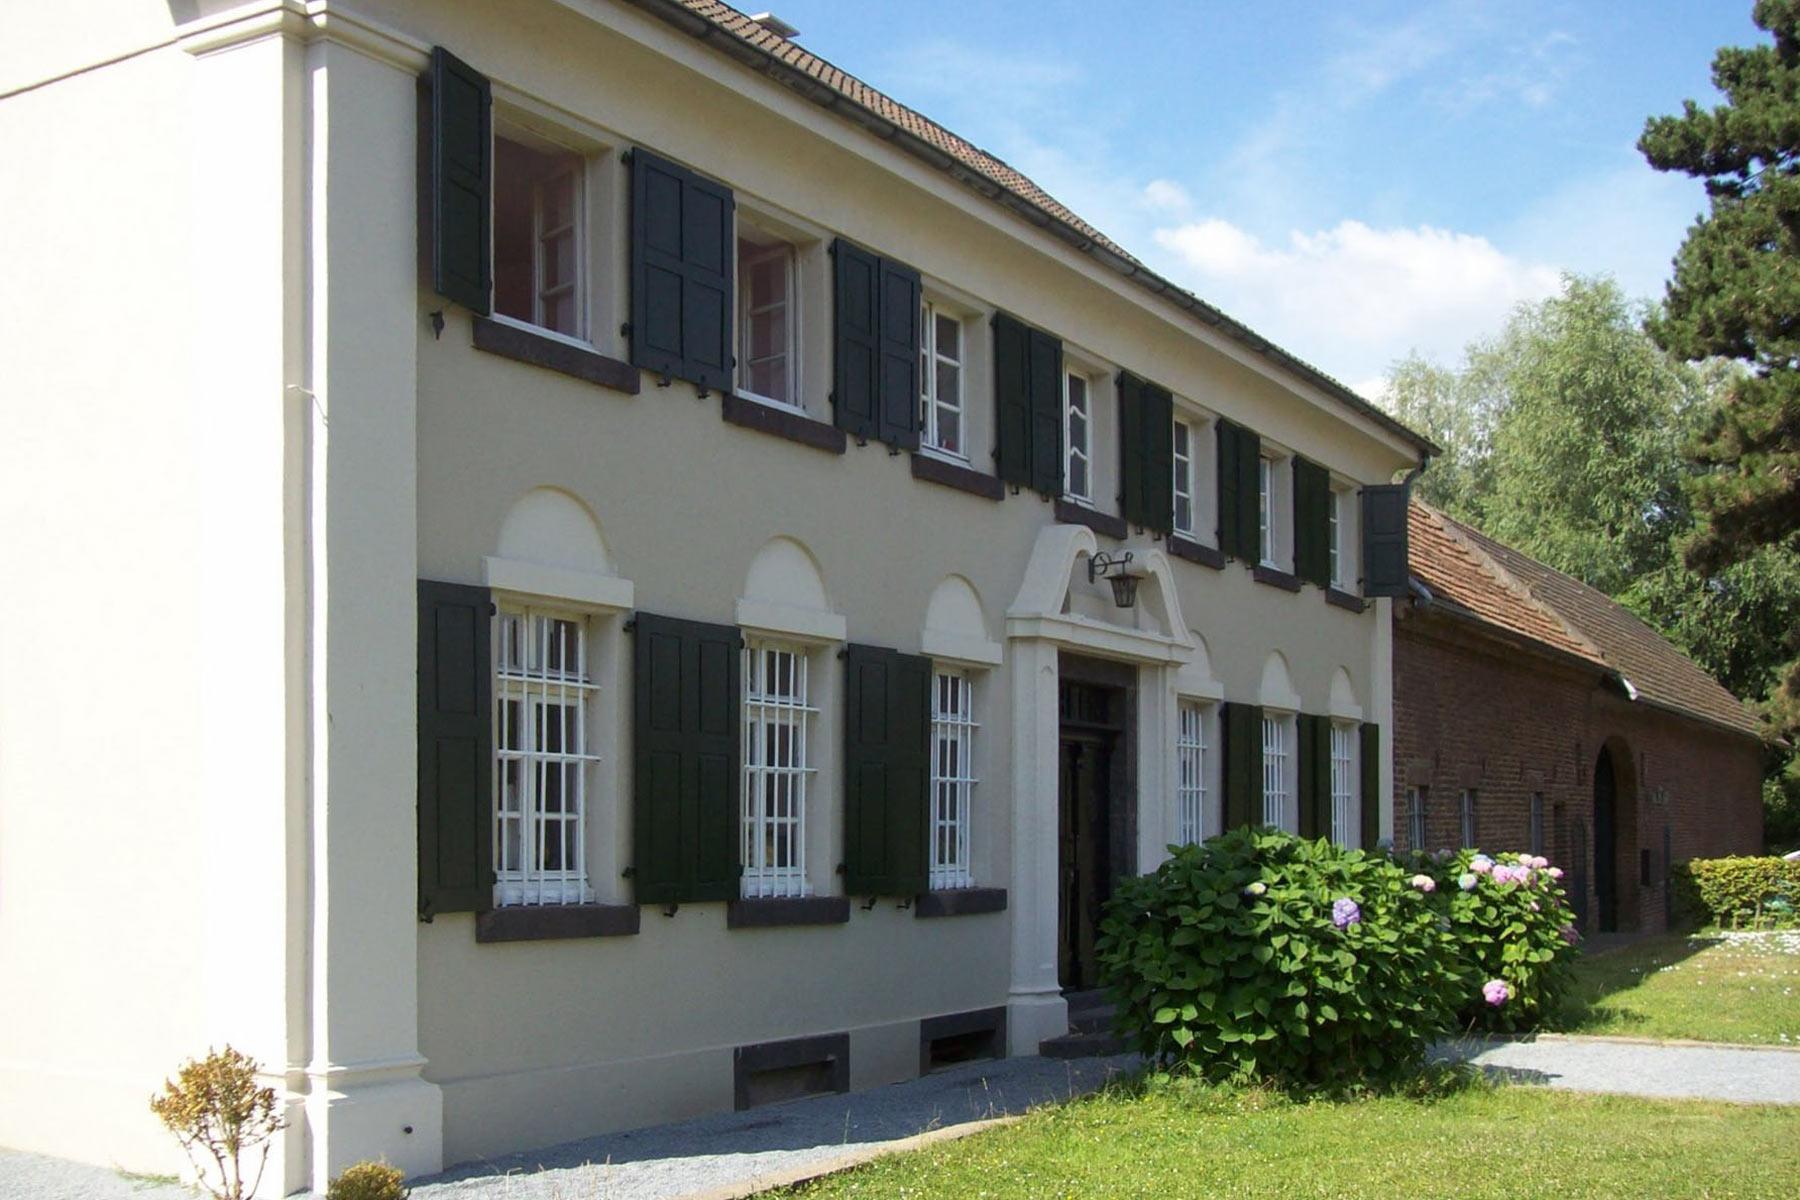 Hotel Gut Hohenholz Bild 1